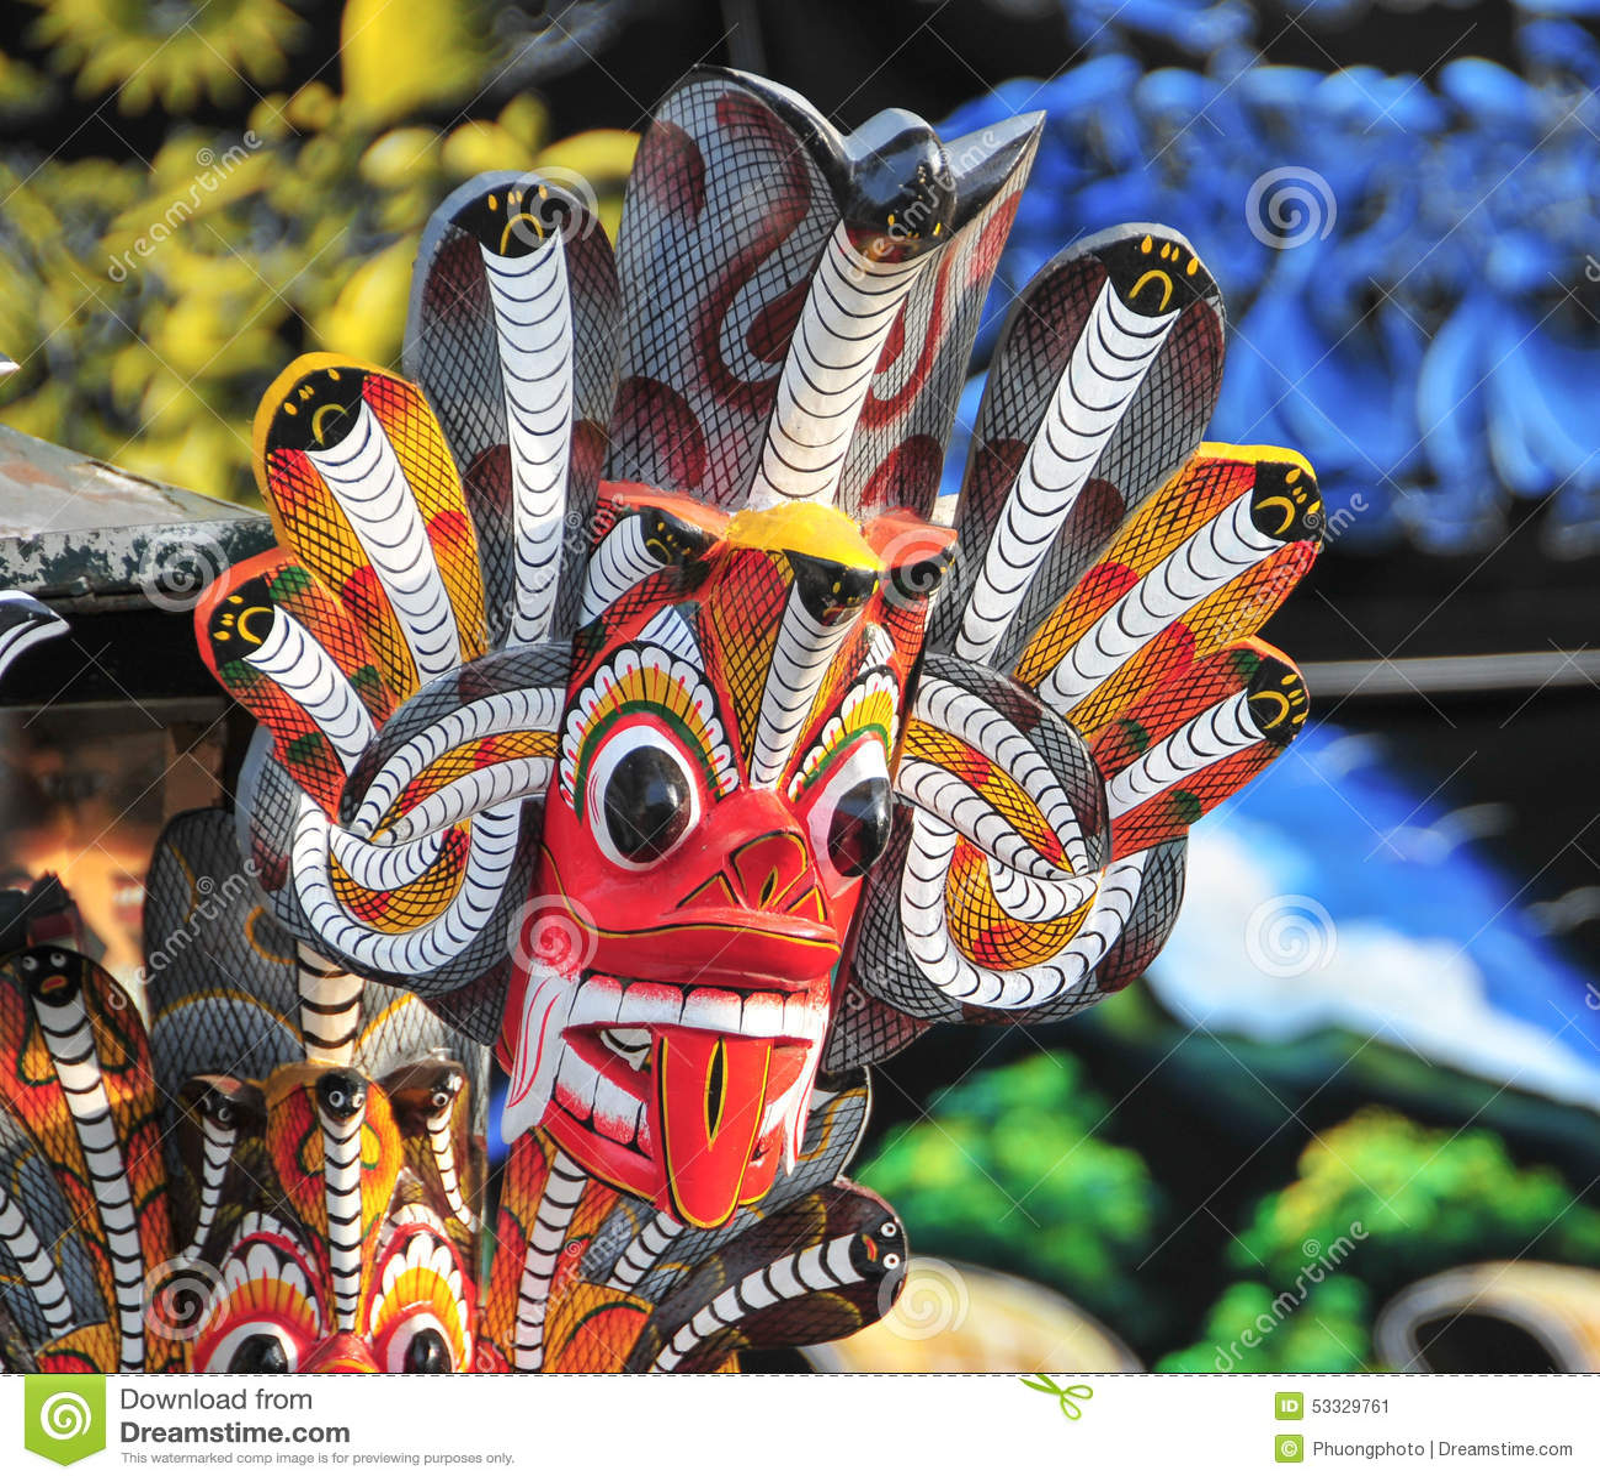 Sri Lankan Traditional Mask Stock Photo Image 53329761